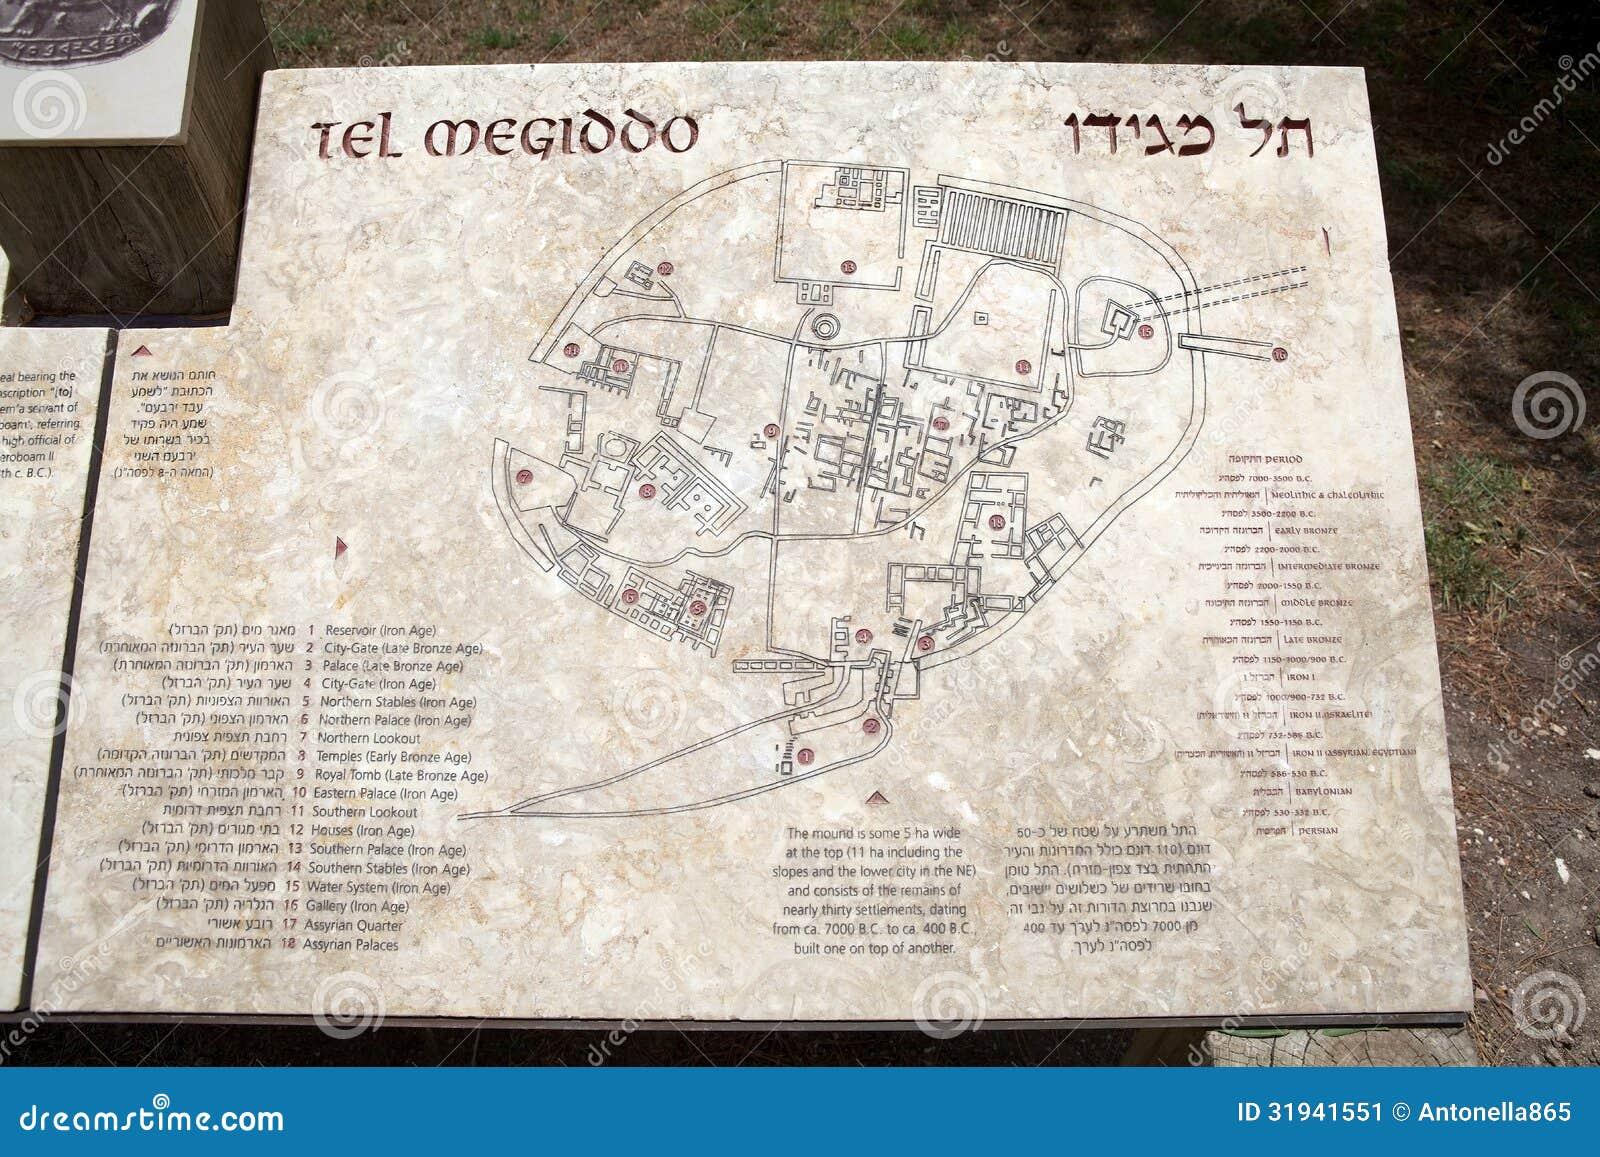 megiddo-archaeological-site-side-explanation-panel-written-english-language-hebraic-language-israel-31941551.jpg